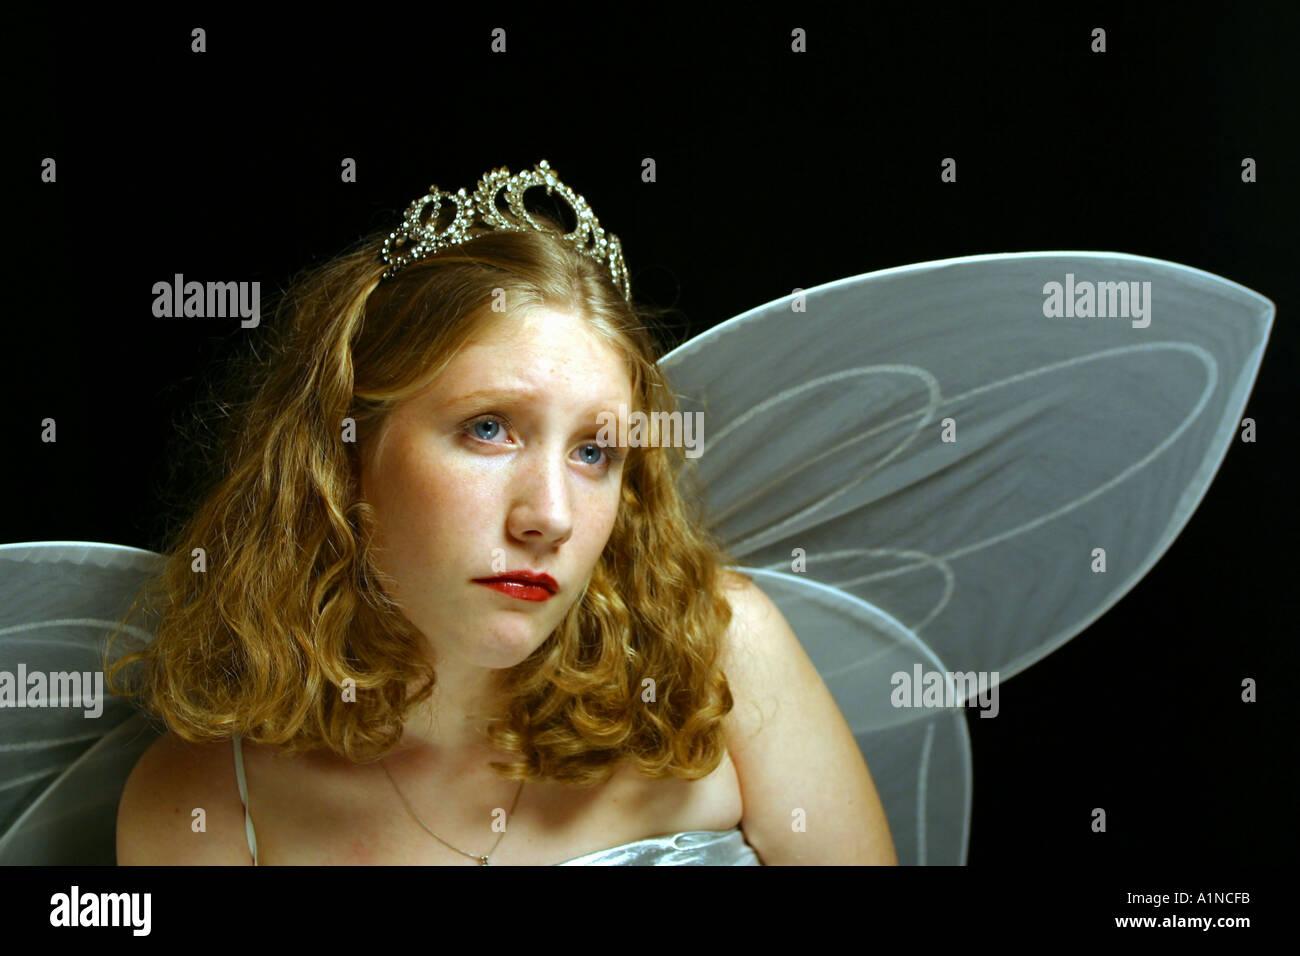 Sad Fairy Princess Photo Photos Photographs People - Stock Image